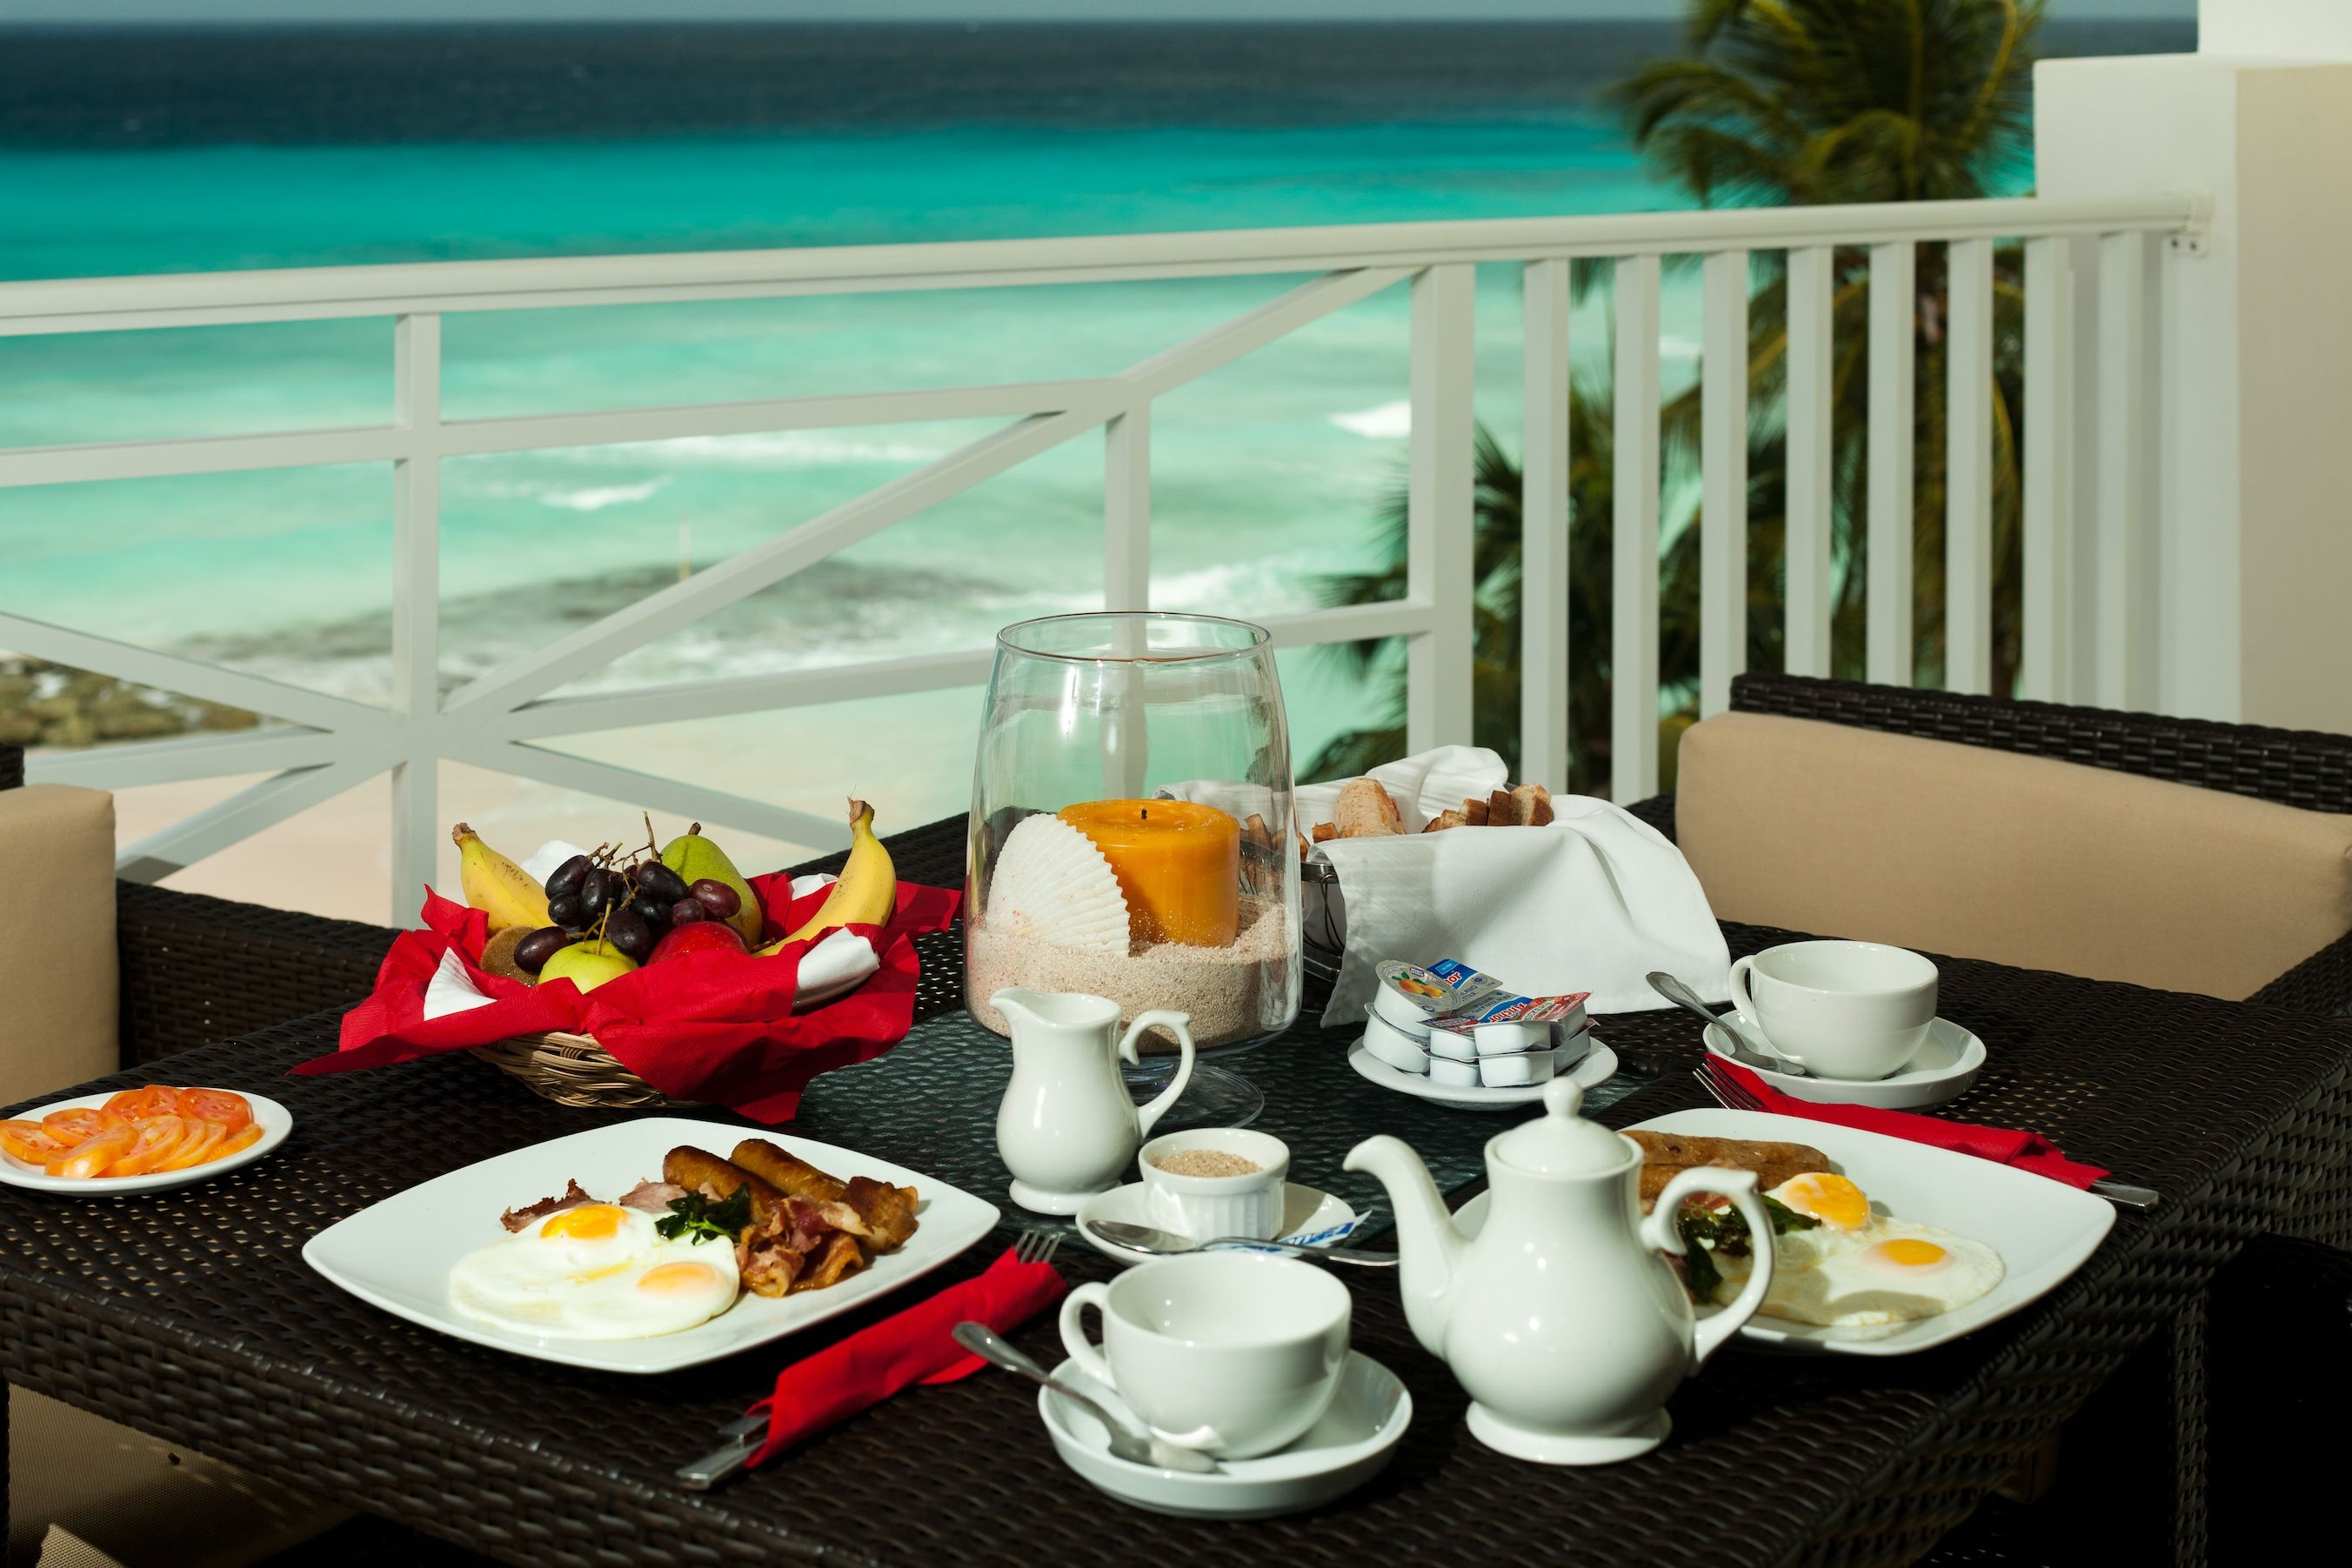 Breakfast in Barbados at Ocean Two, a Barbados beach resort offering ...